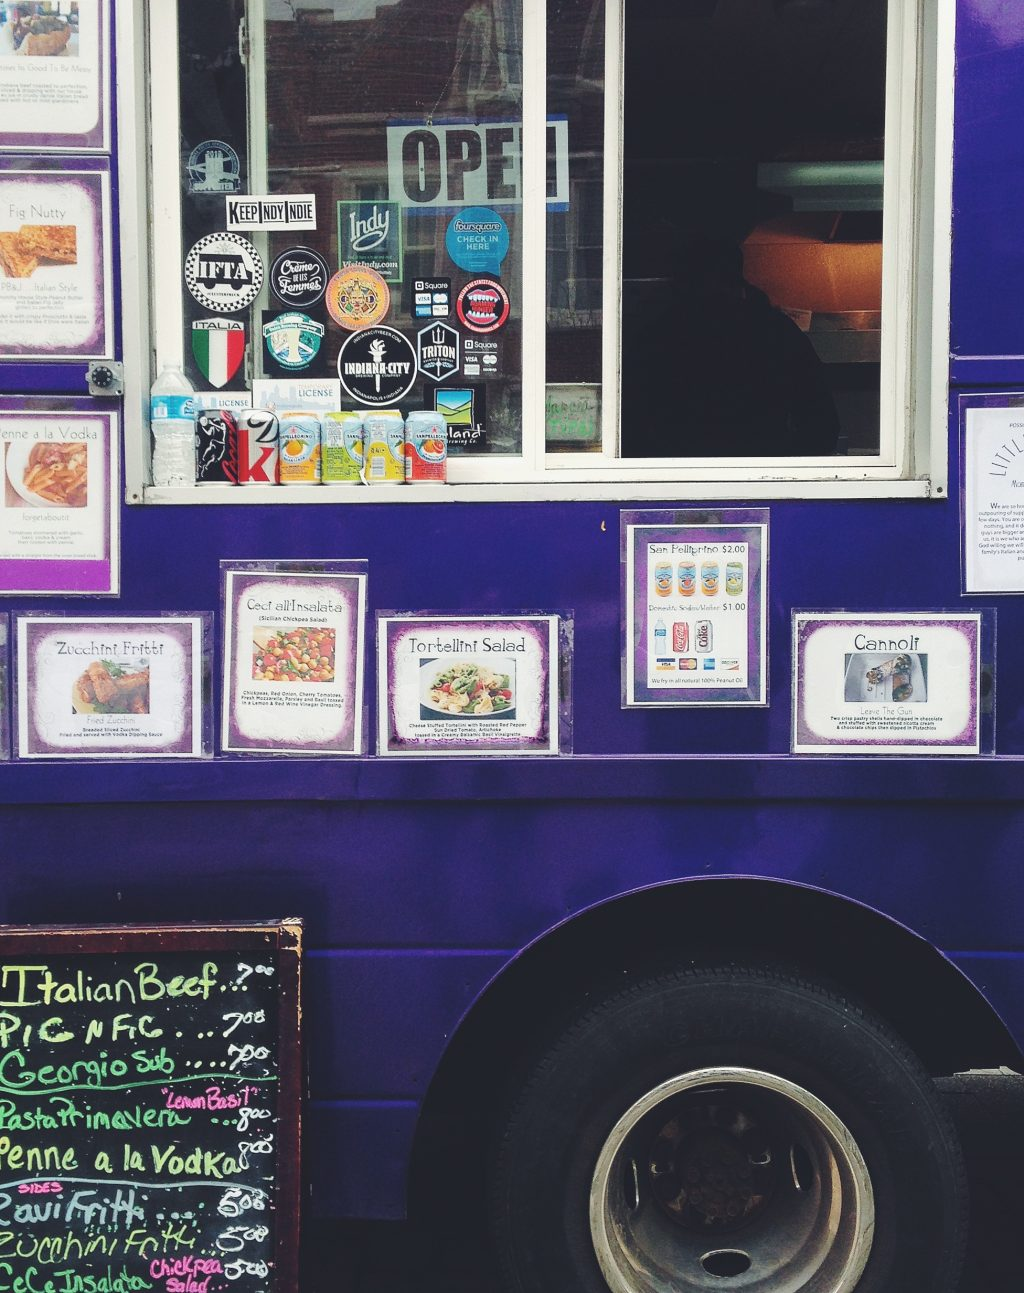 Indiana Food Truck Alliance